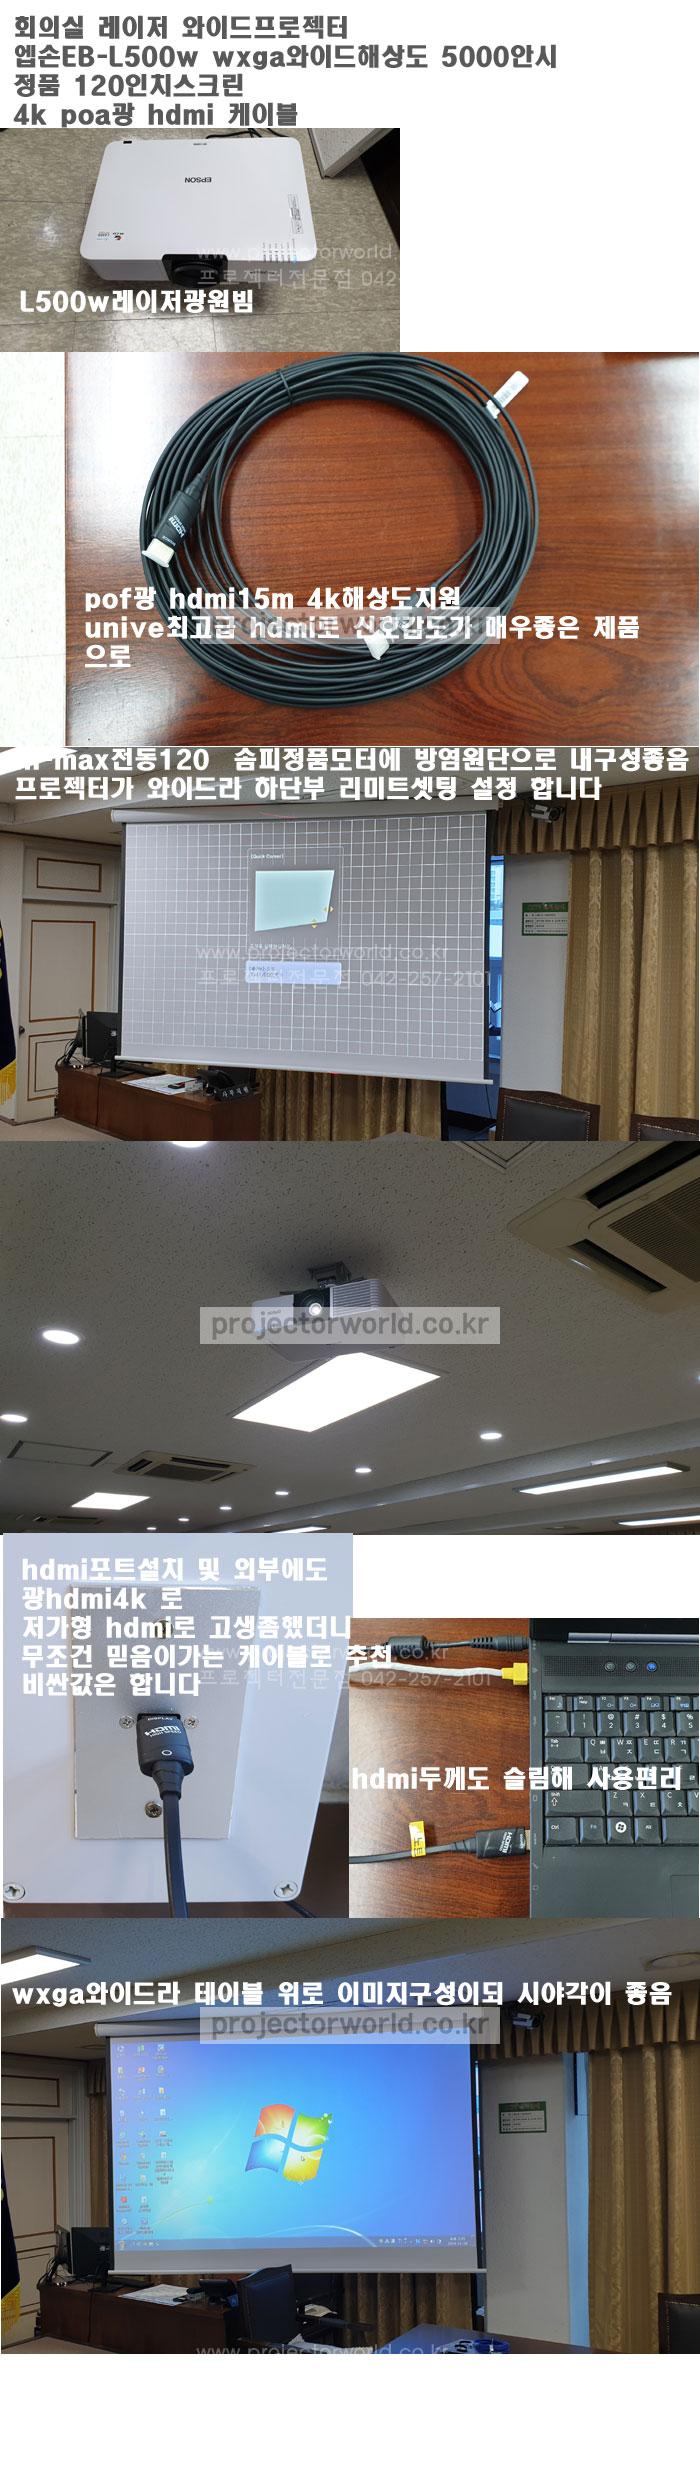 eb-l500w,대전프로젝터설치,세종프로젝터판매,unive,광hdmi4k지원,